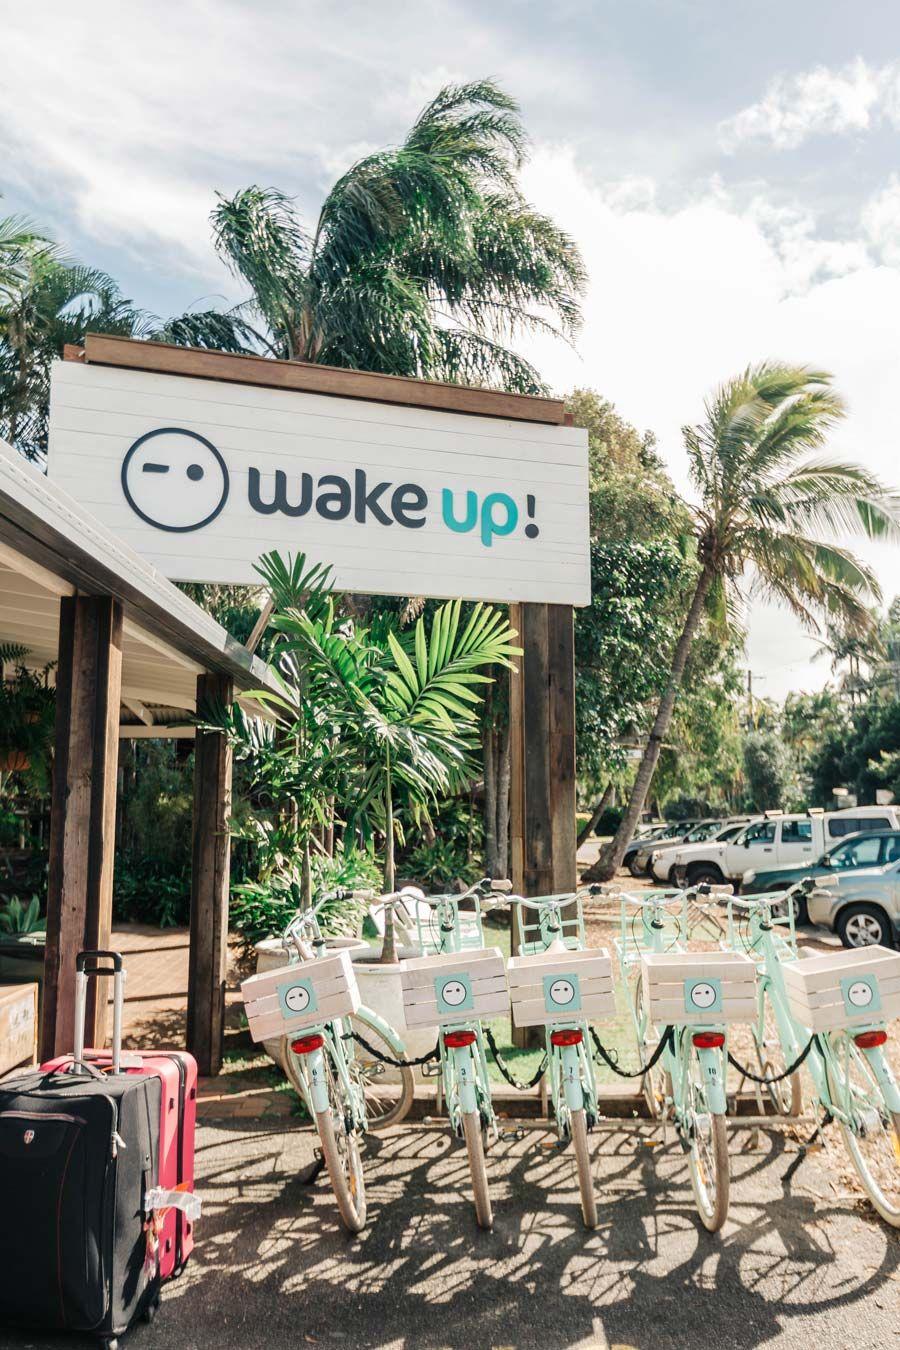 Location Wake Up